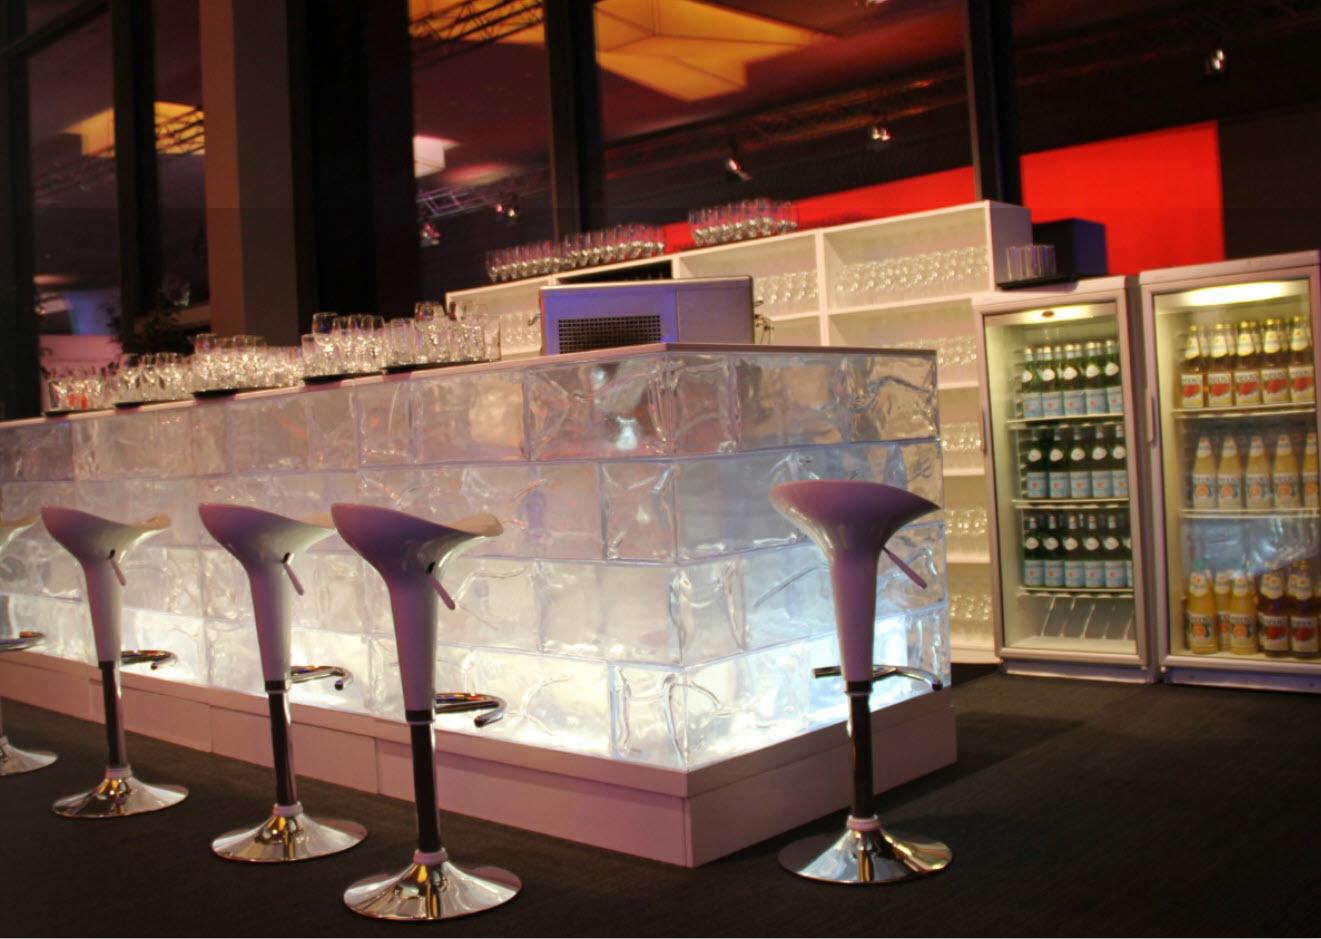 Luxus-Barhocker BOMBO - Designer-Tresenhocker-Klassiker (Stefano Giovannoni, Magis - für Bar, Gastro, Lounge)